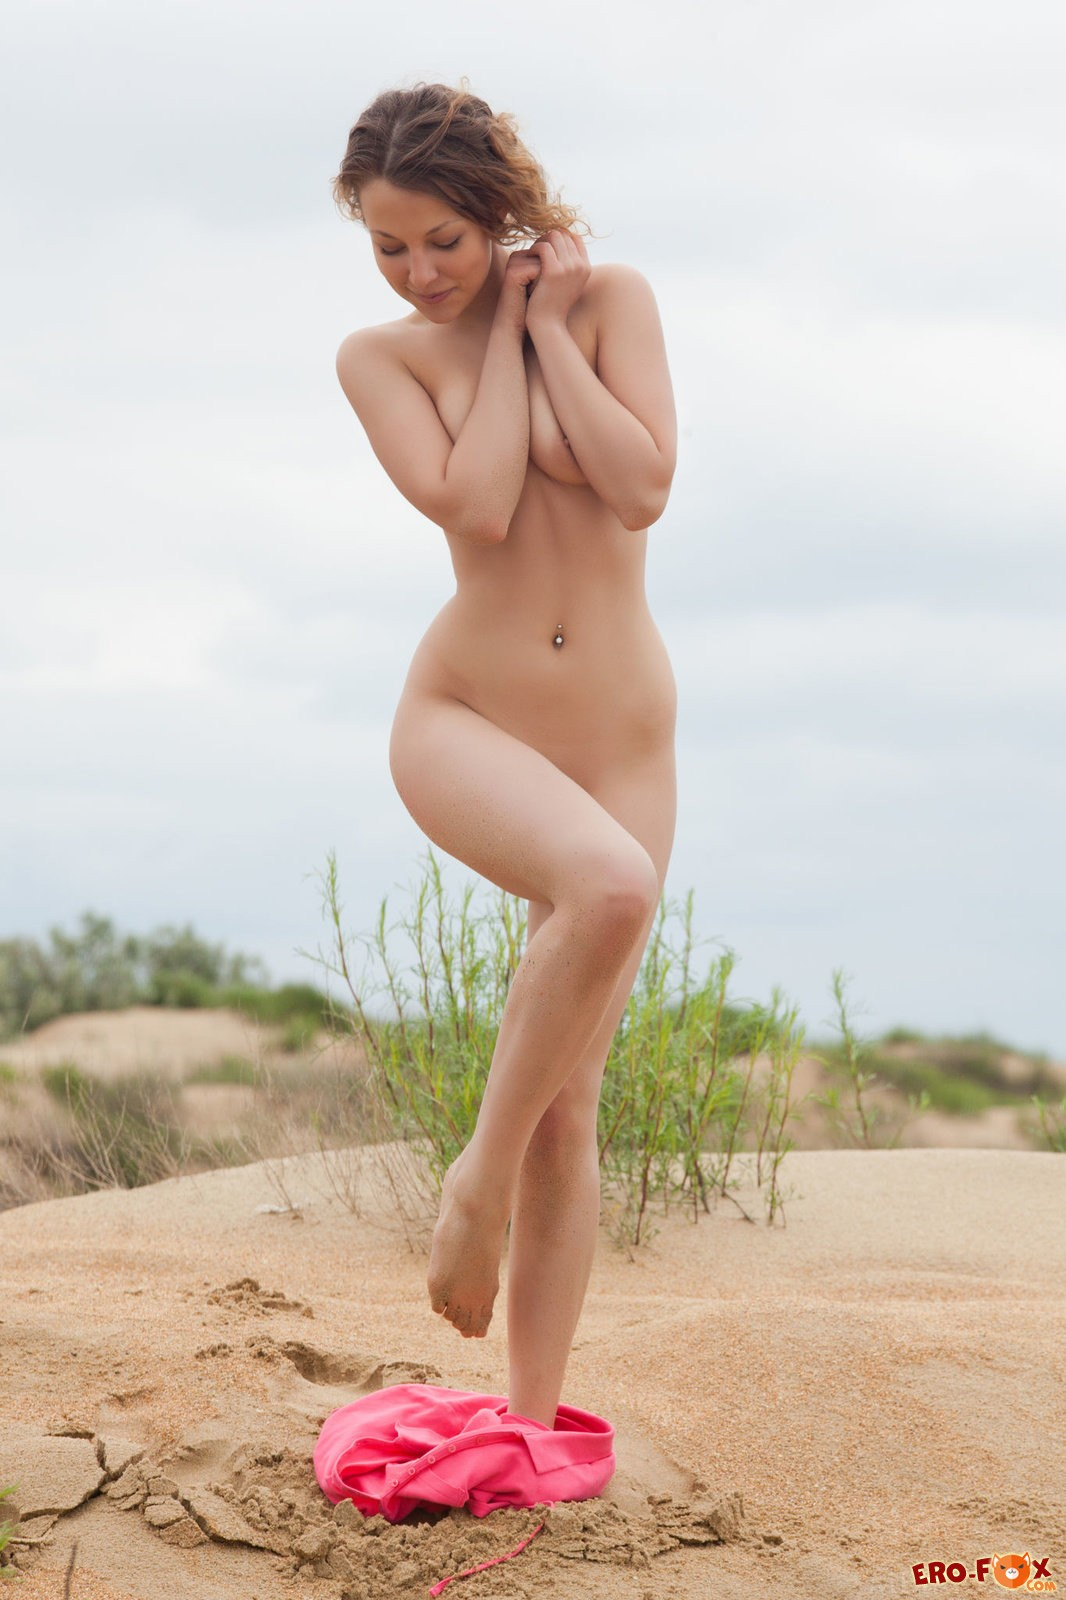 Разделась до гола на пляже  эротика.